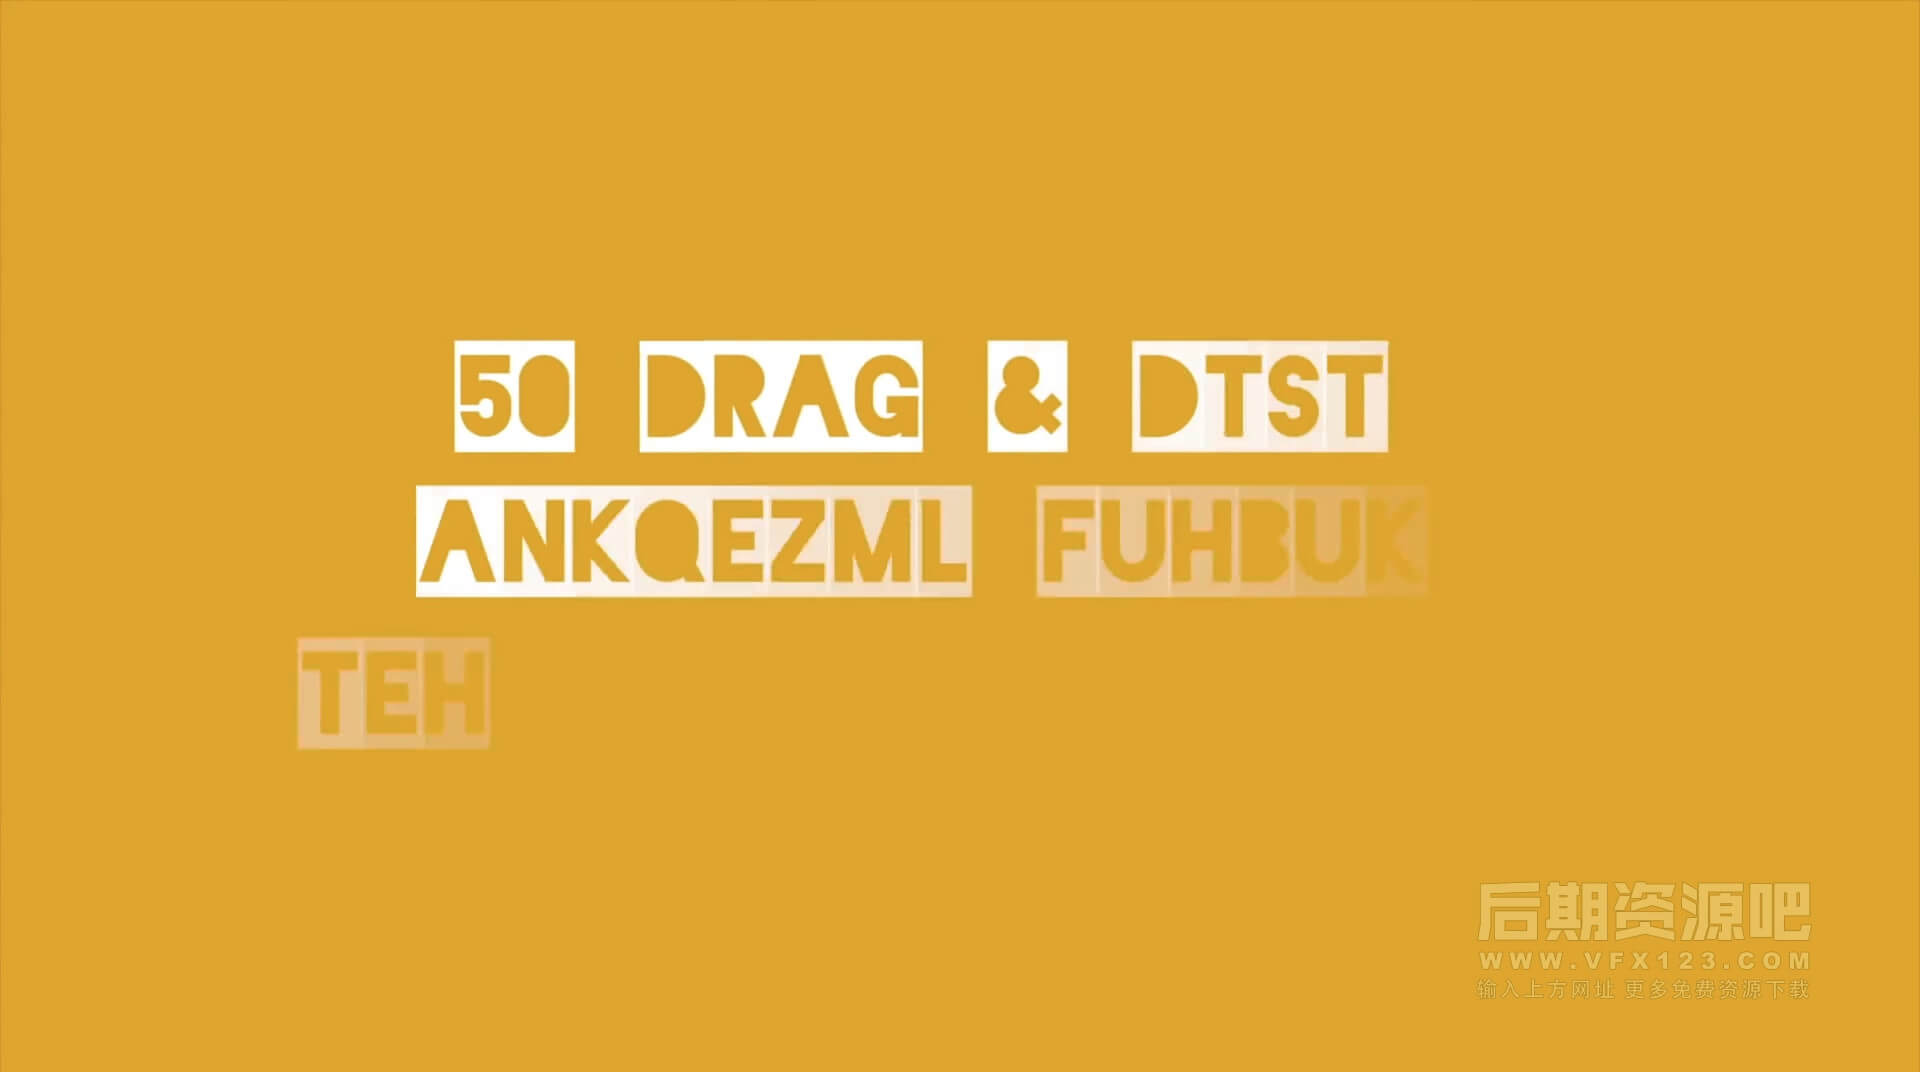 Fcpx标题插件 50个弹跳抖动光晕扫光可爱有趣字幕动画 vlog标题模板 | MAC影视后期资源站